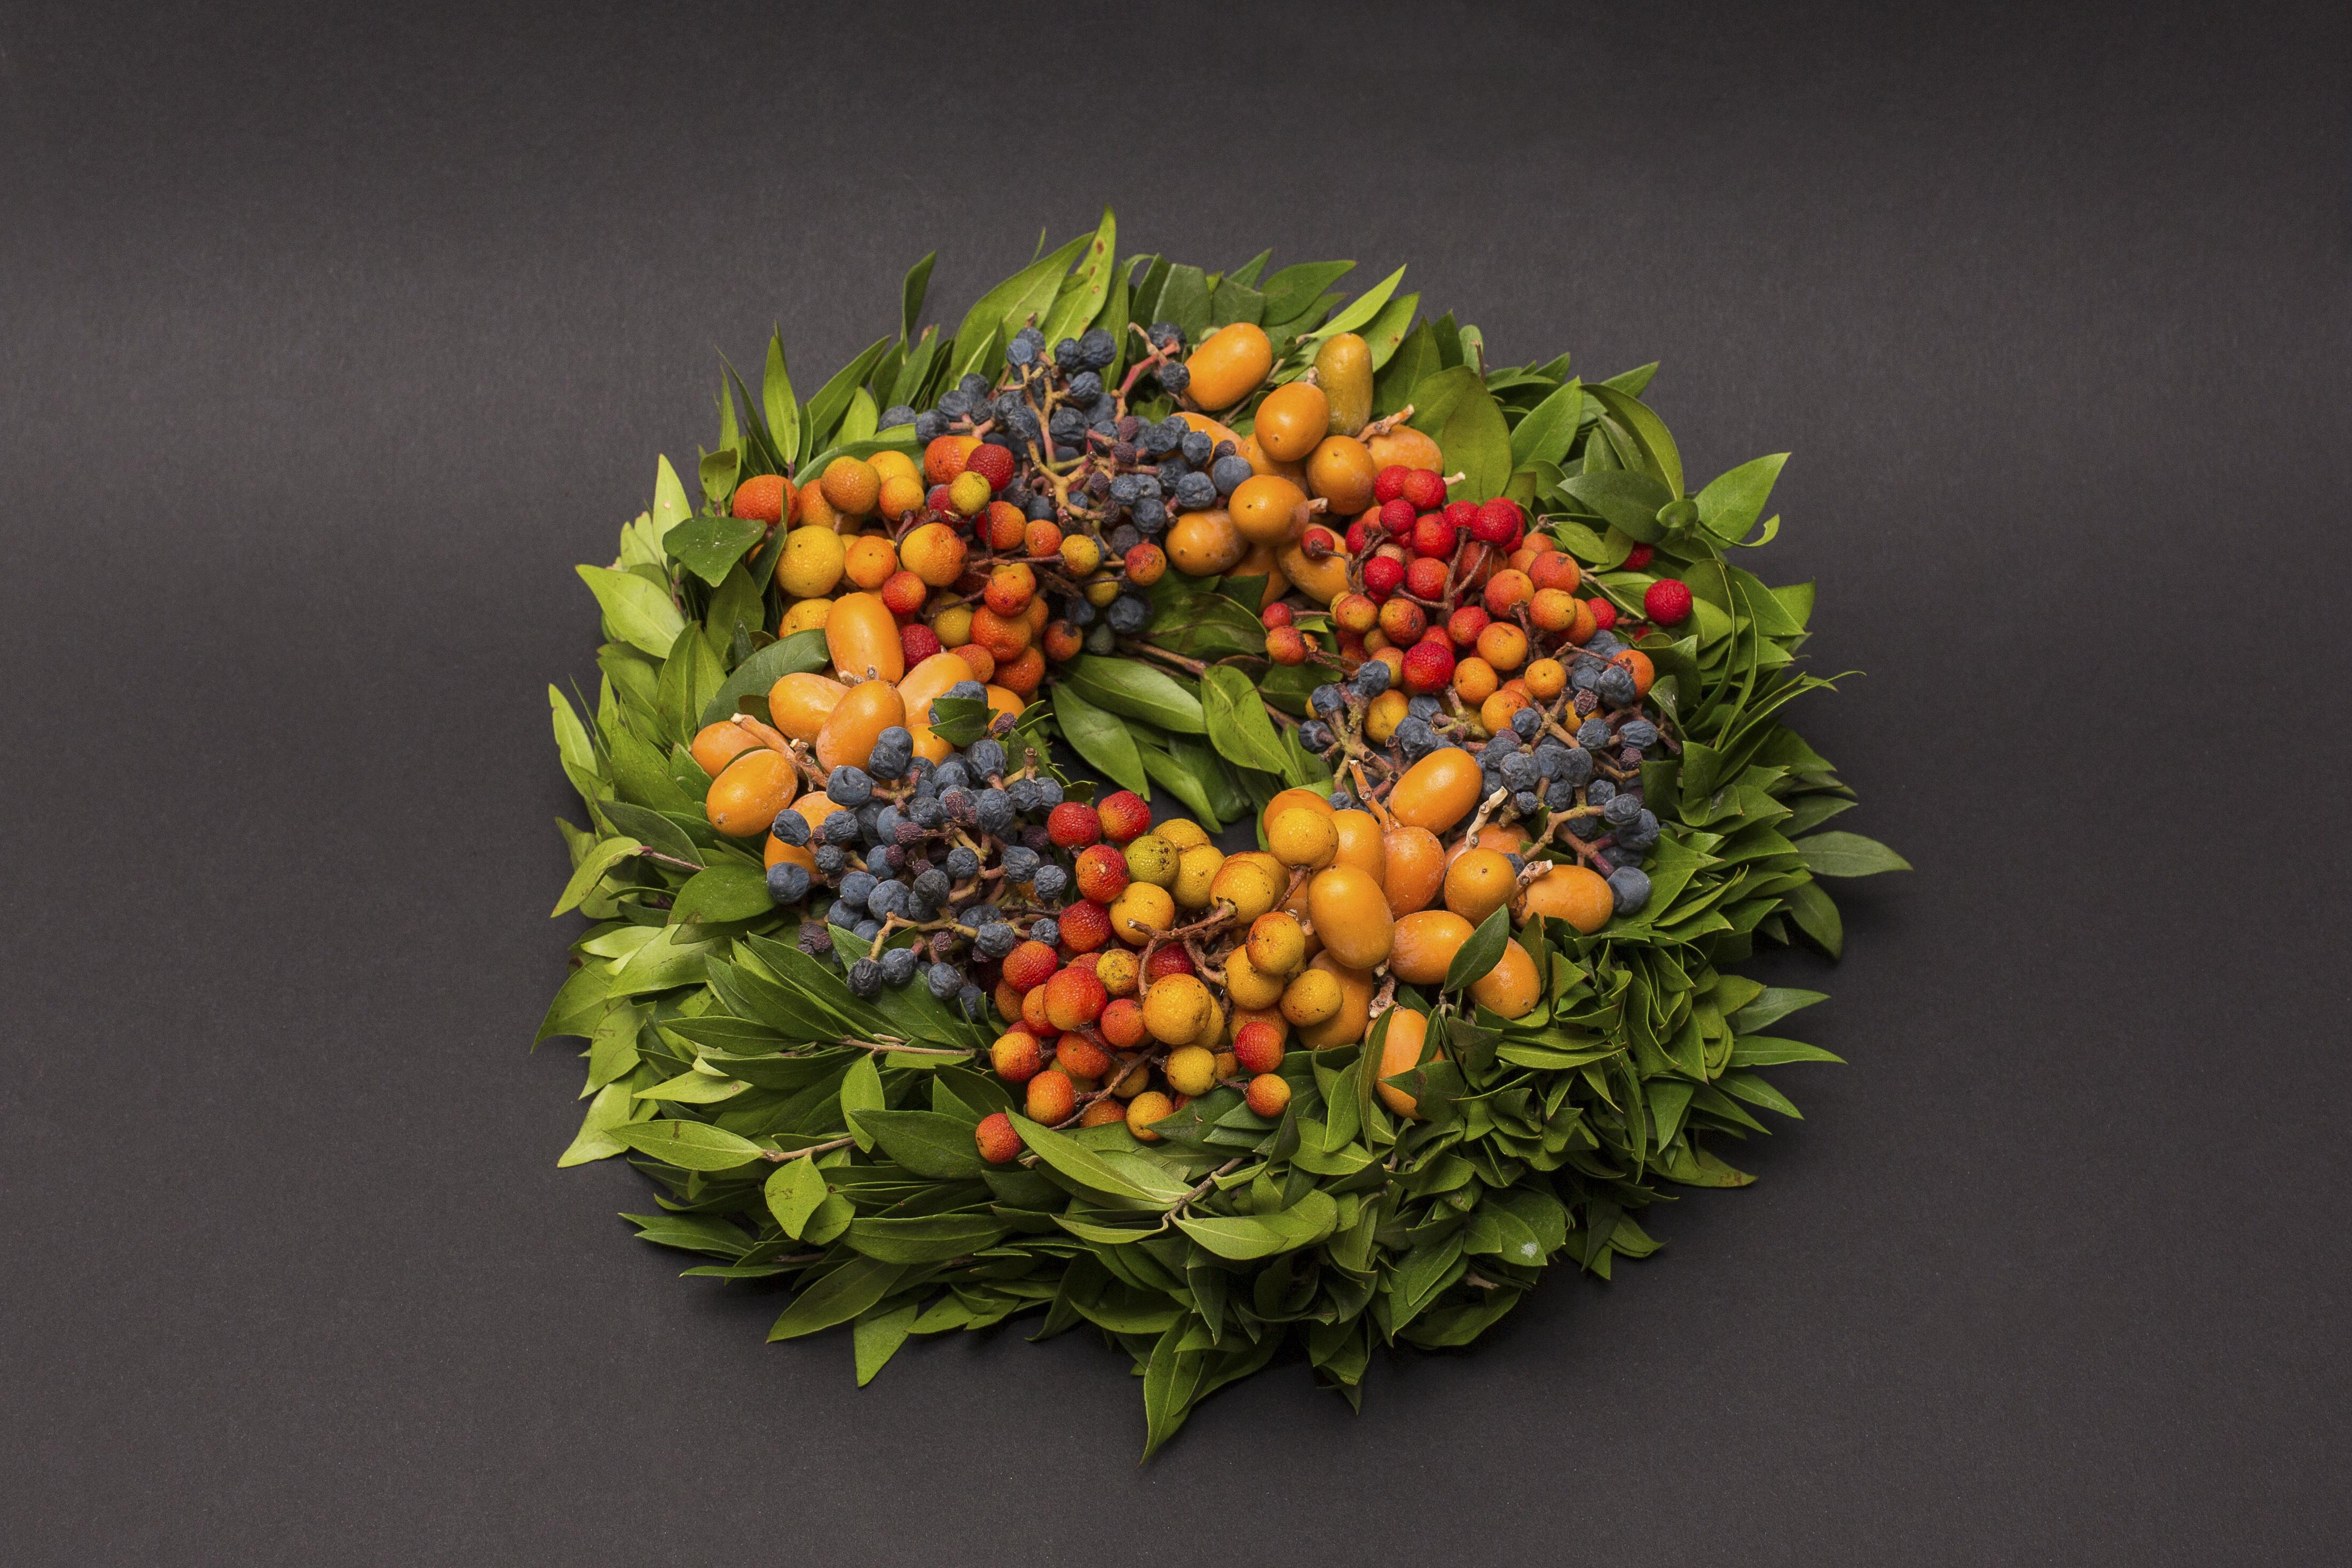 Free Images : branch, fruit, leaf, food, produce, flowers, berries ...